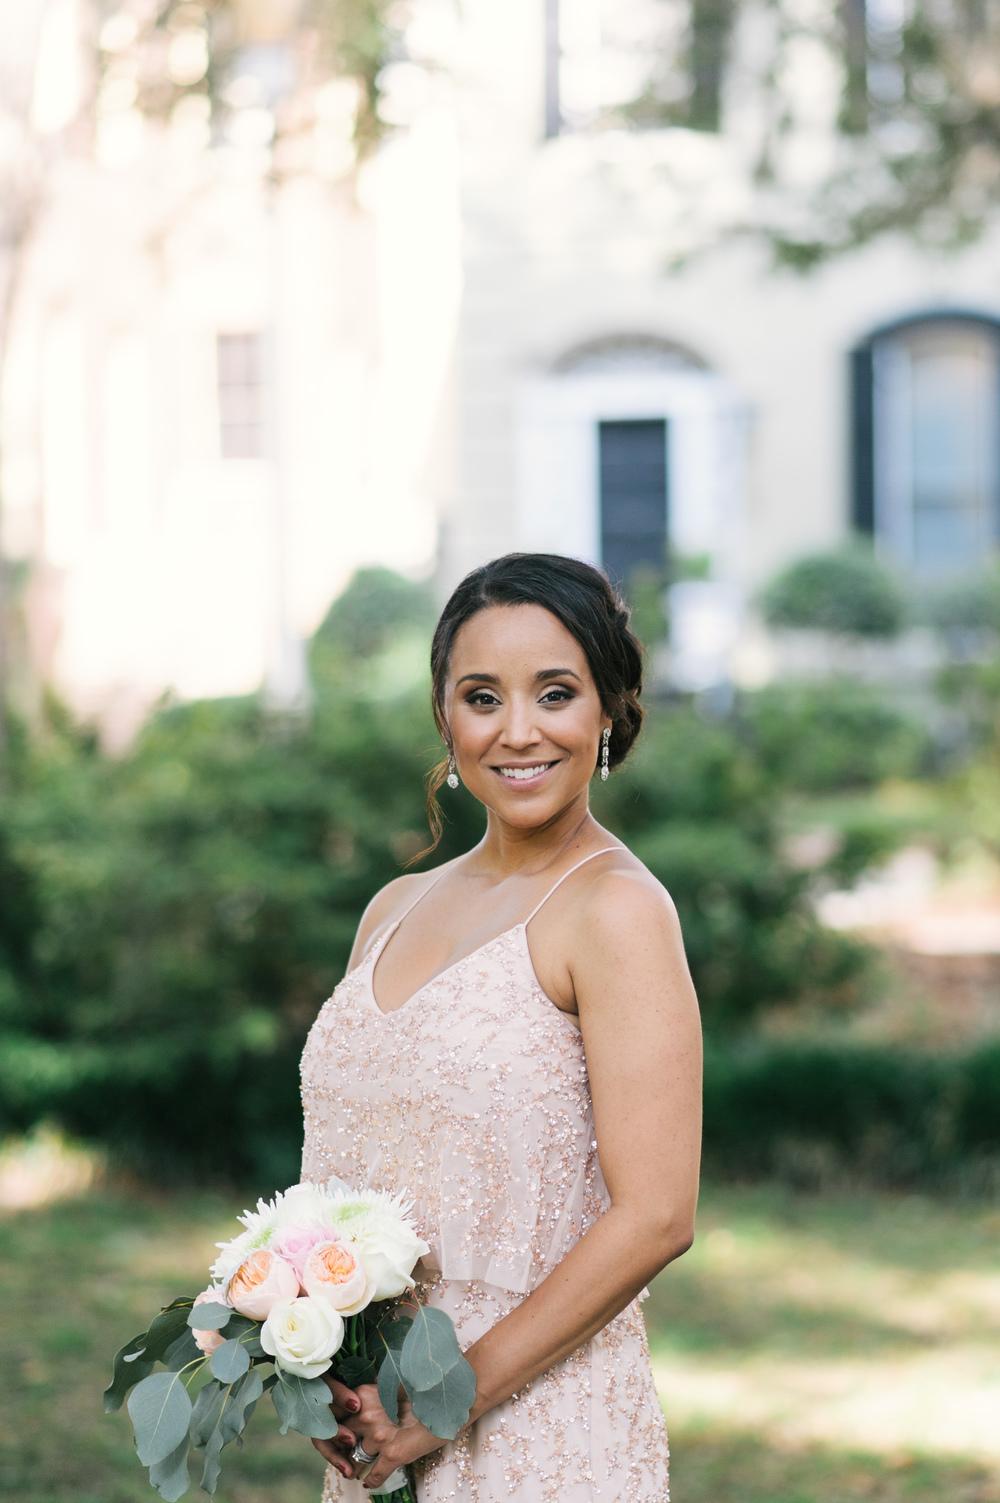 kacey-and-niall-June-4-savanna-georgia-wedding-m-newsom-photography- (516 of 961).jpg